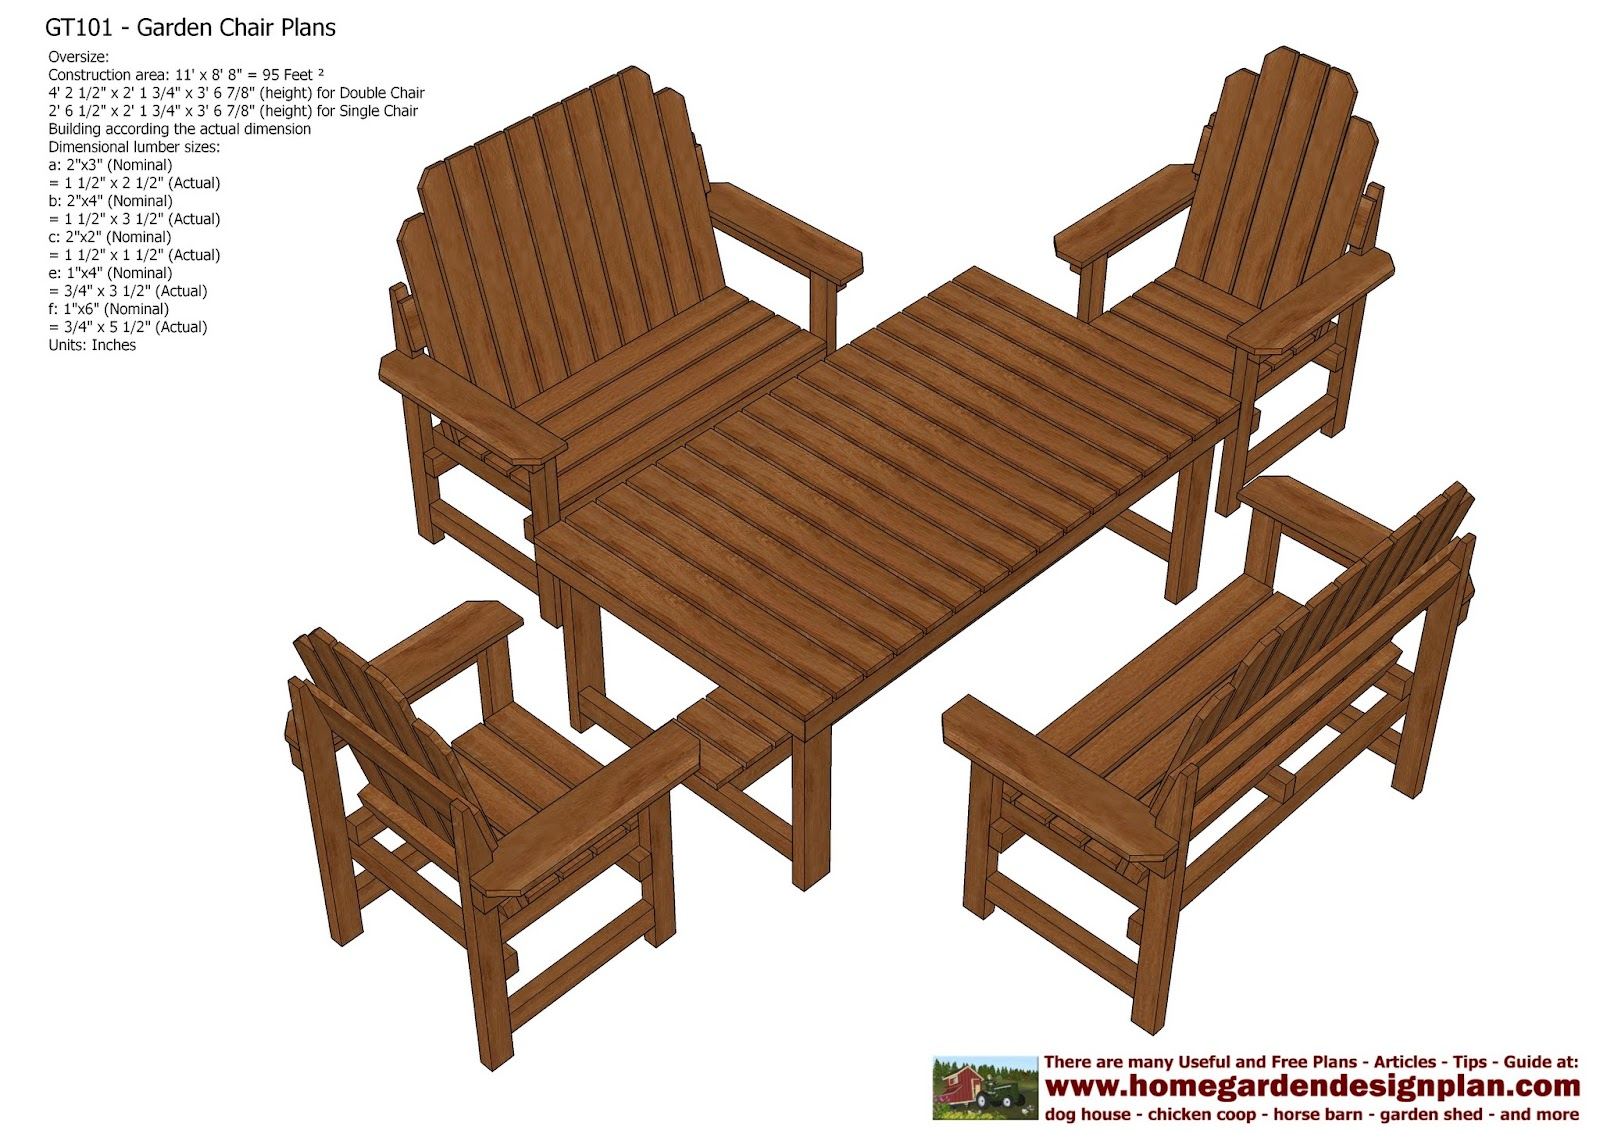 home garden plans GT101 Garden Teak Table Plans Out